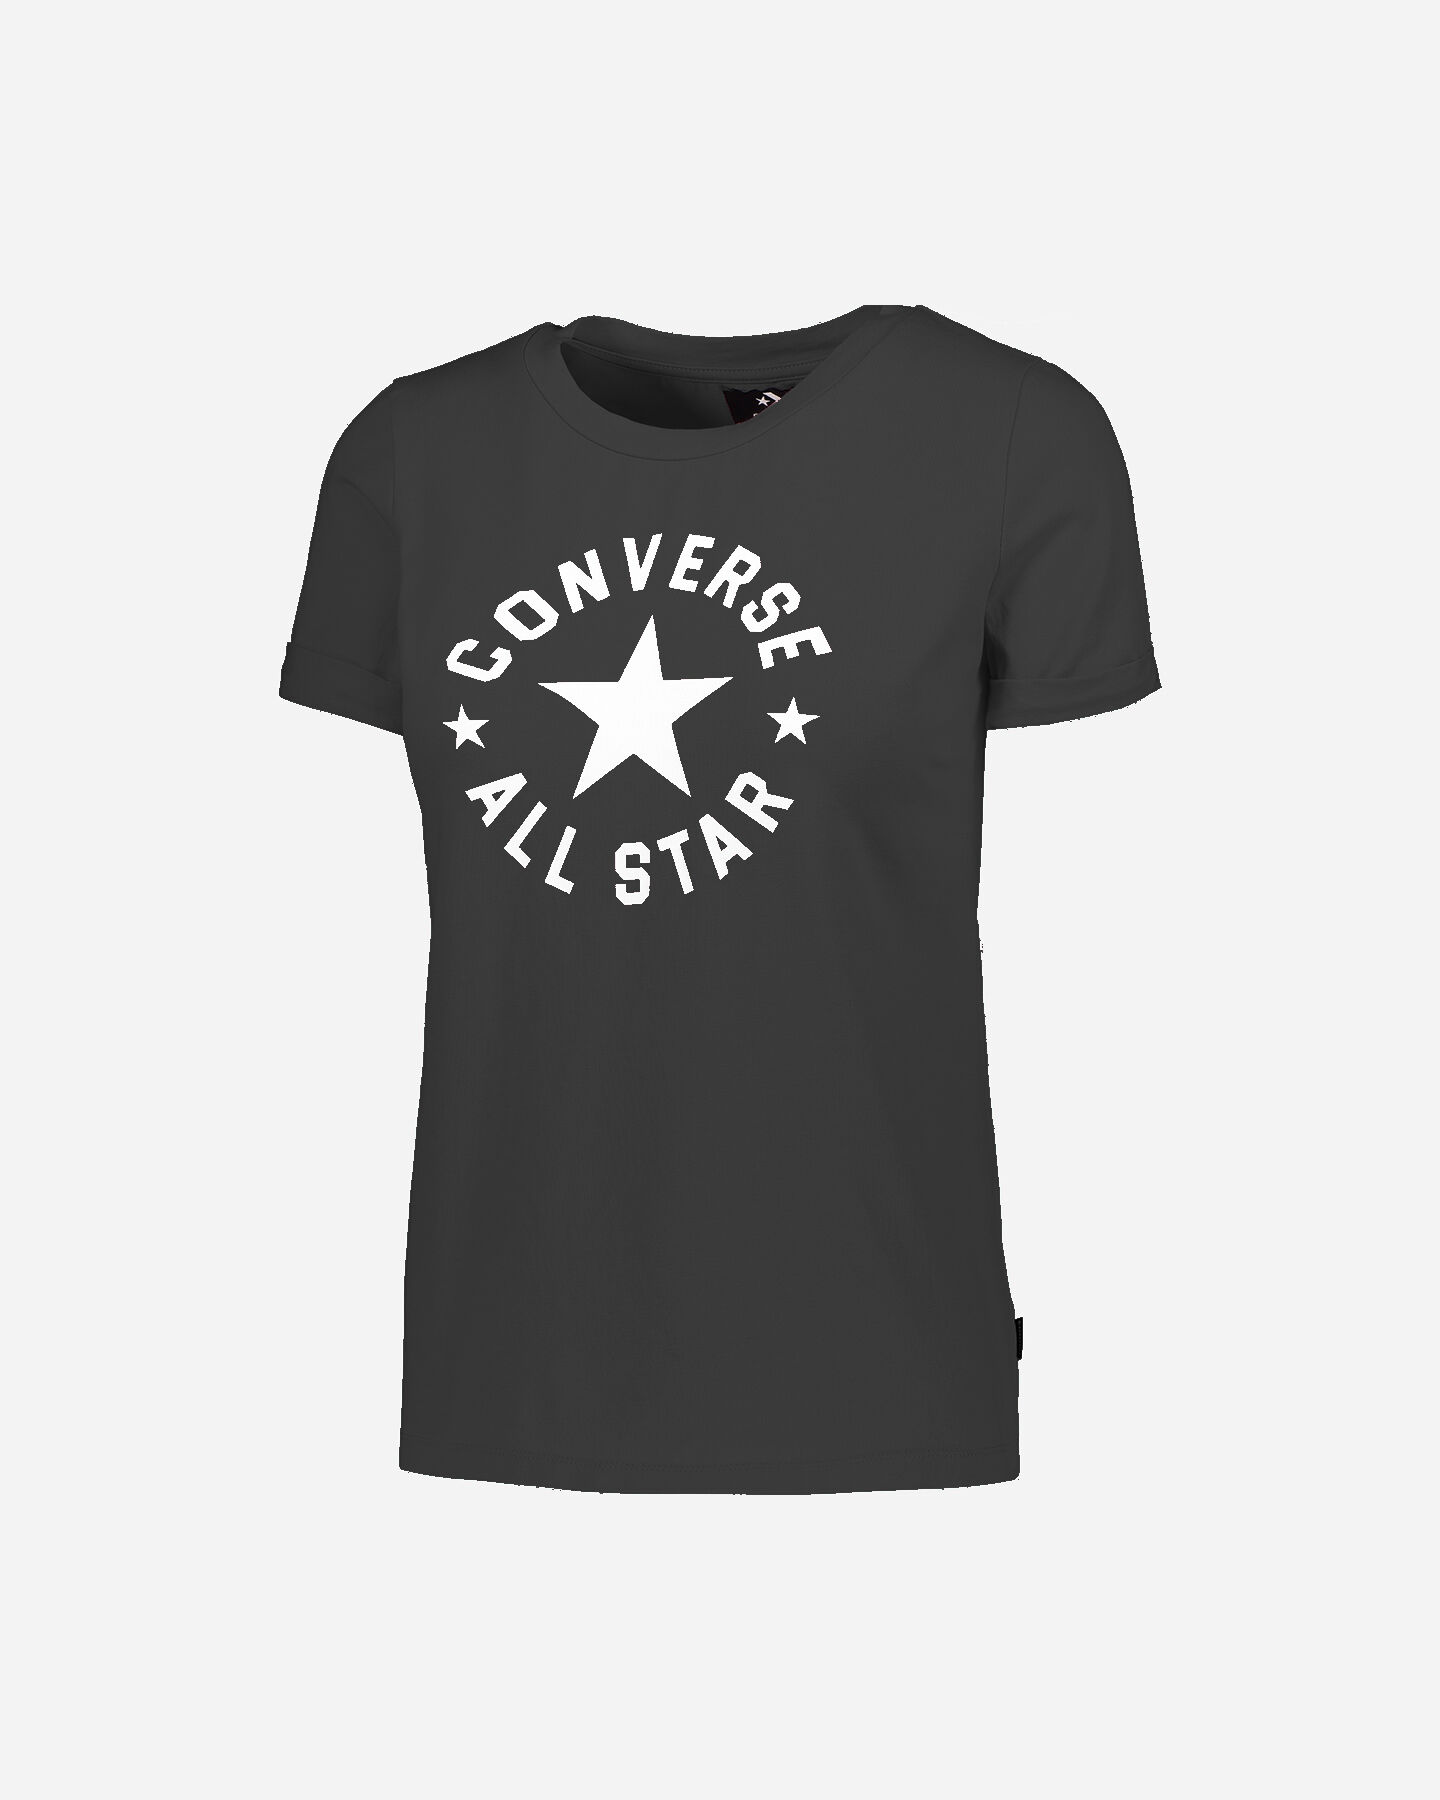 T-Shirt CONVERSE LOGO CLASSIC W S5181123 scatto 0